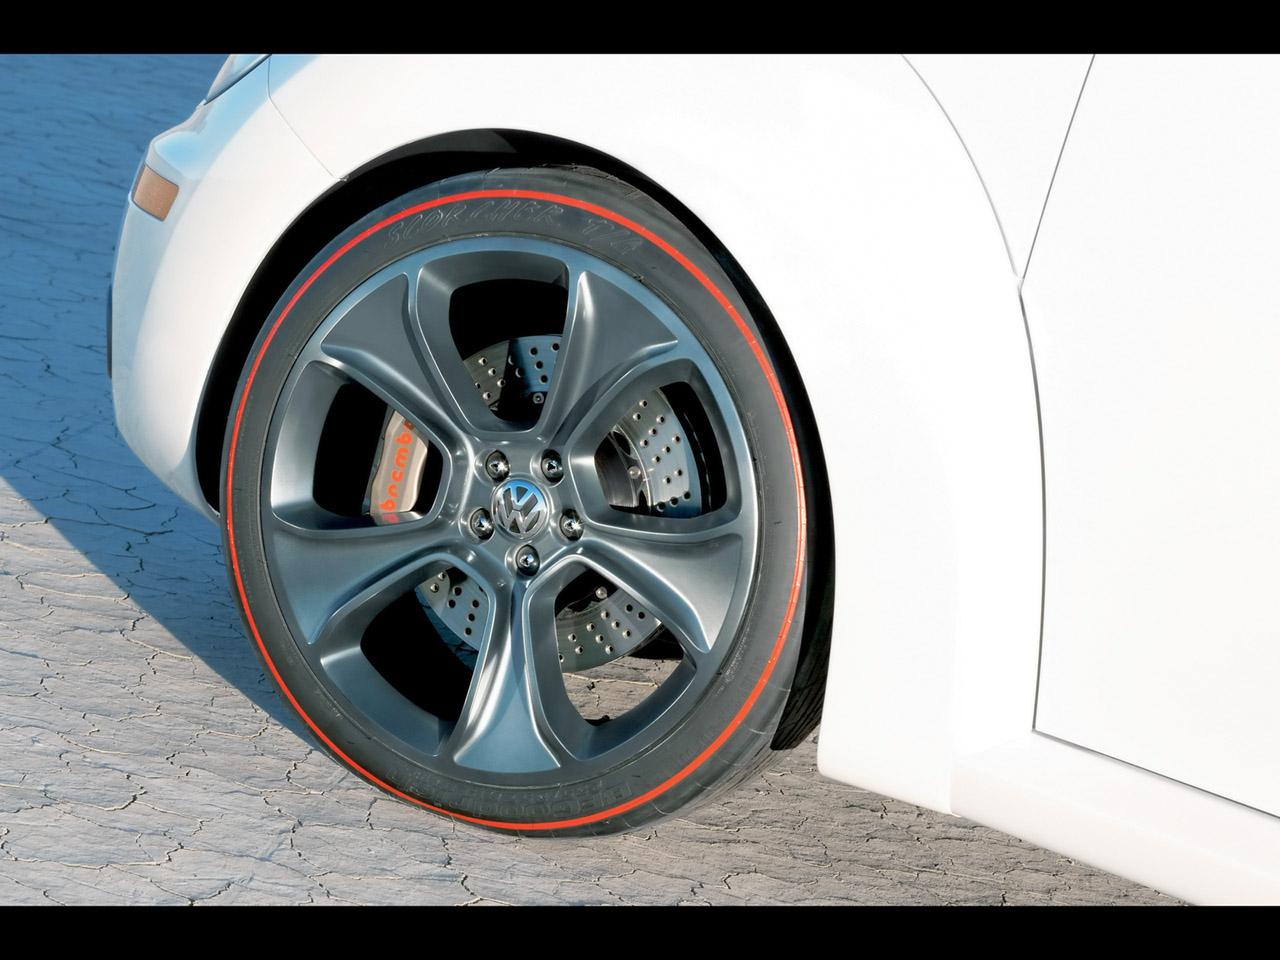 2005 VW Beetle Wheels